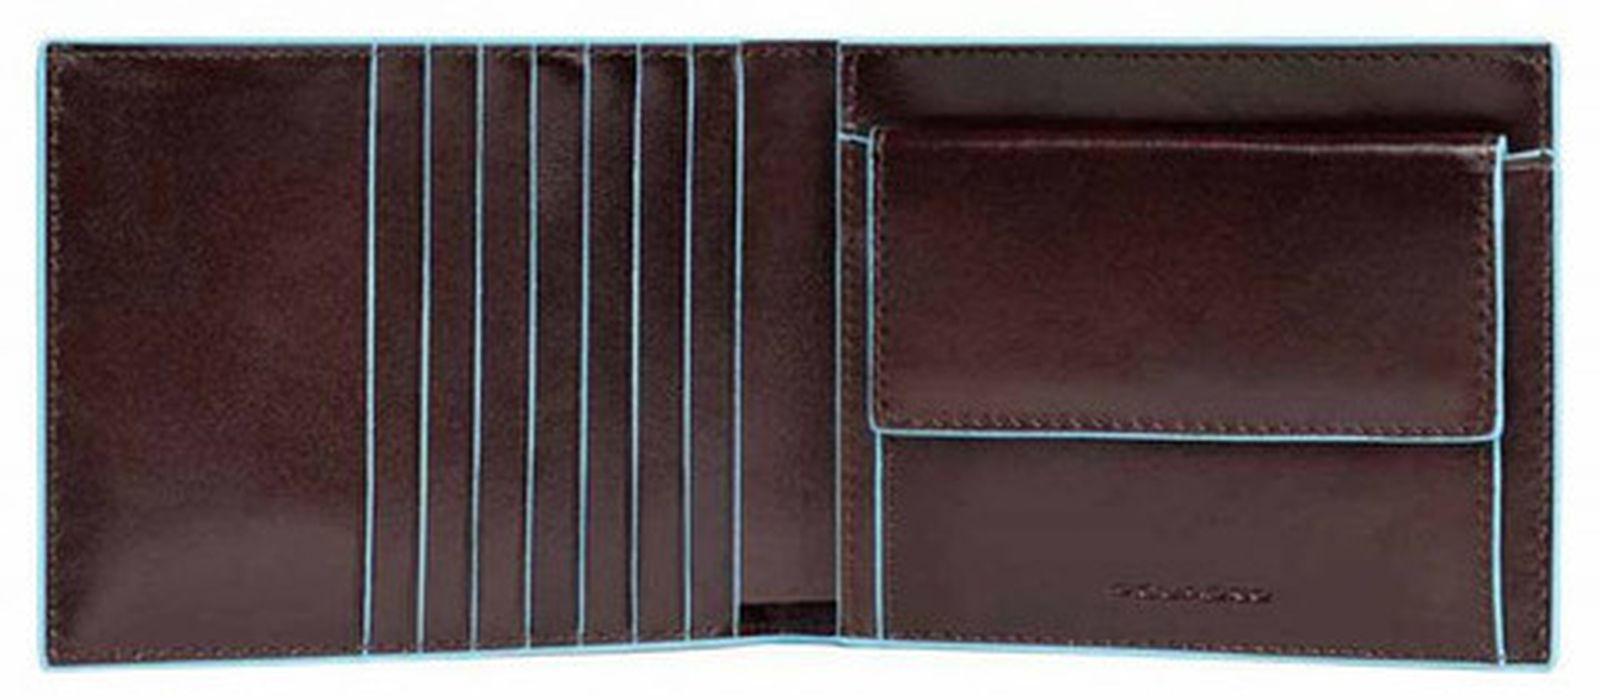 3d209c67ee70 Кошелек мужской Piquadro Blue Square, цвет коричневый, 12,5х9,5х2 см ...